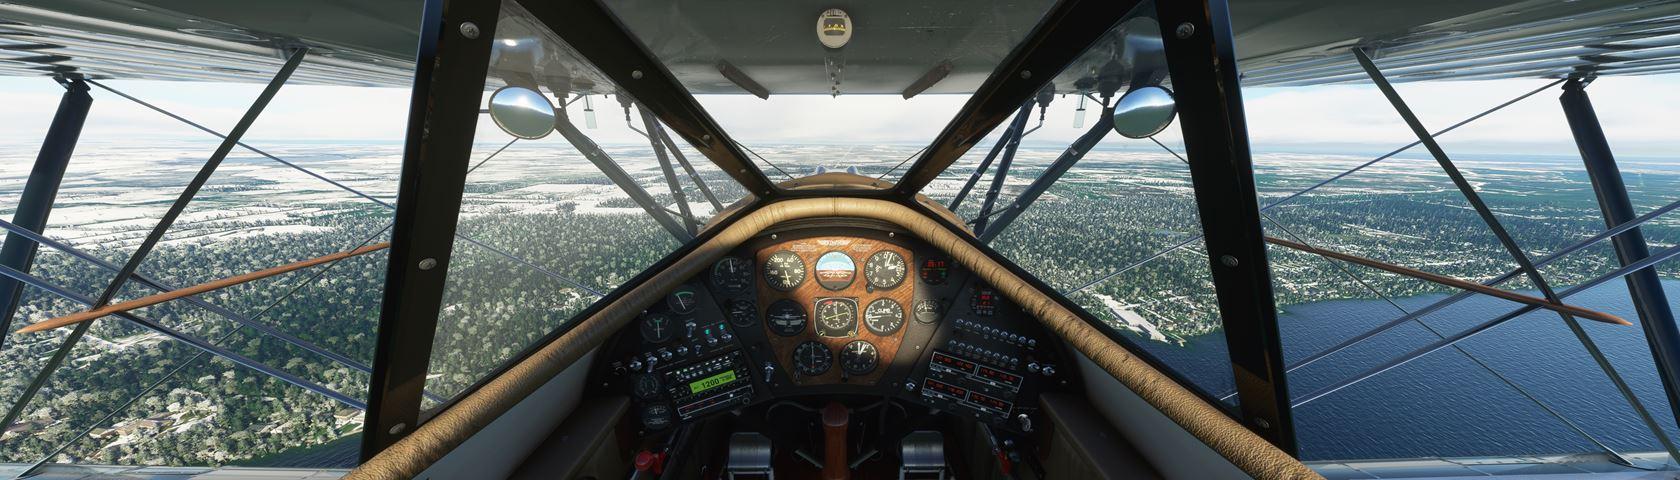 FS2020 WACO YMF-5 cockpit